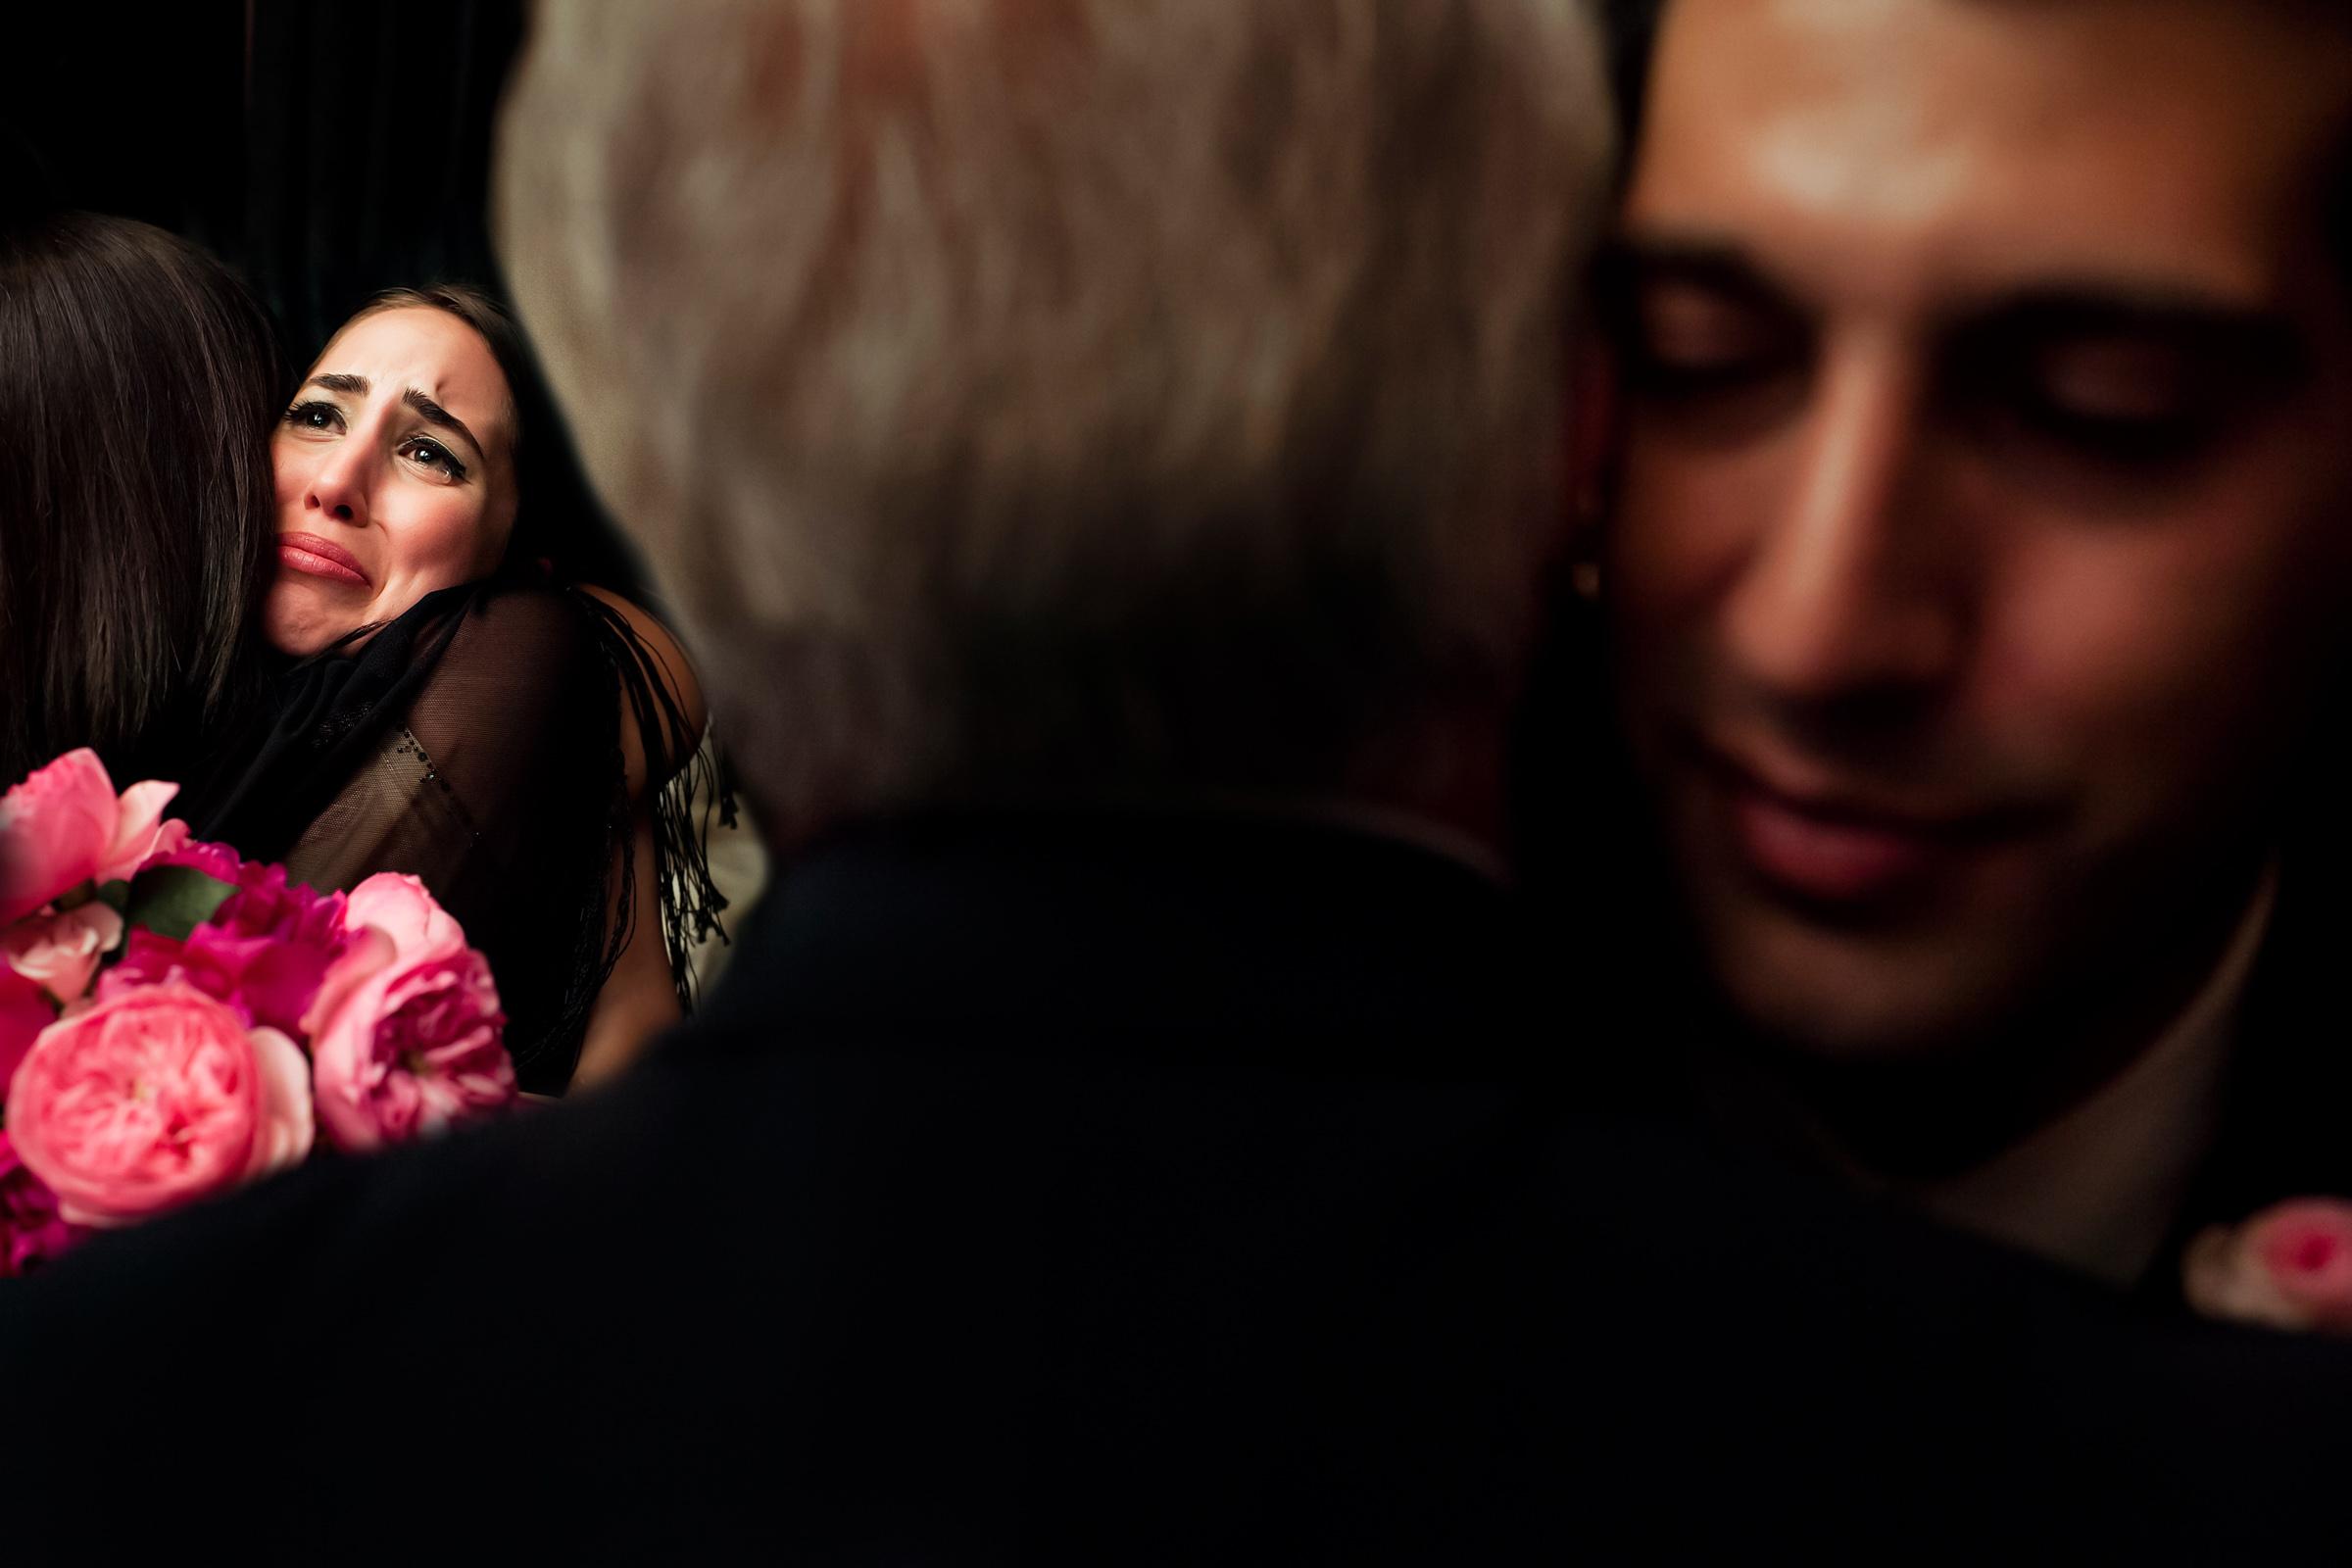 Bride and groom embrace parents - photo by Chrisman Studios